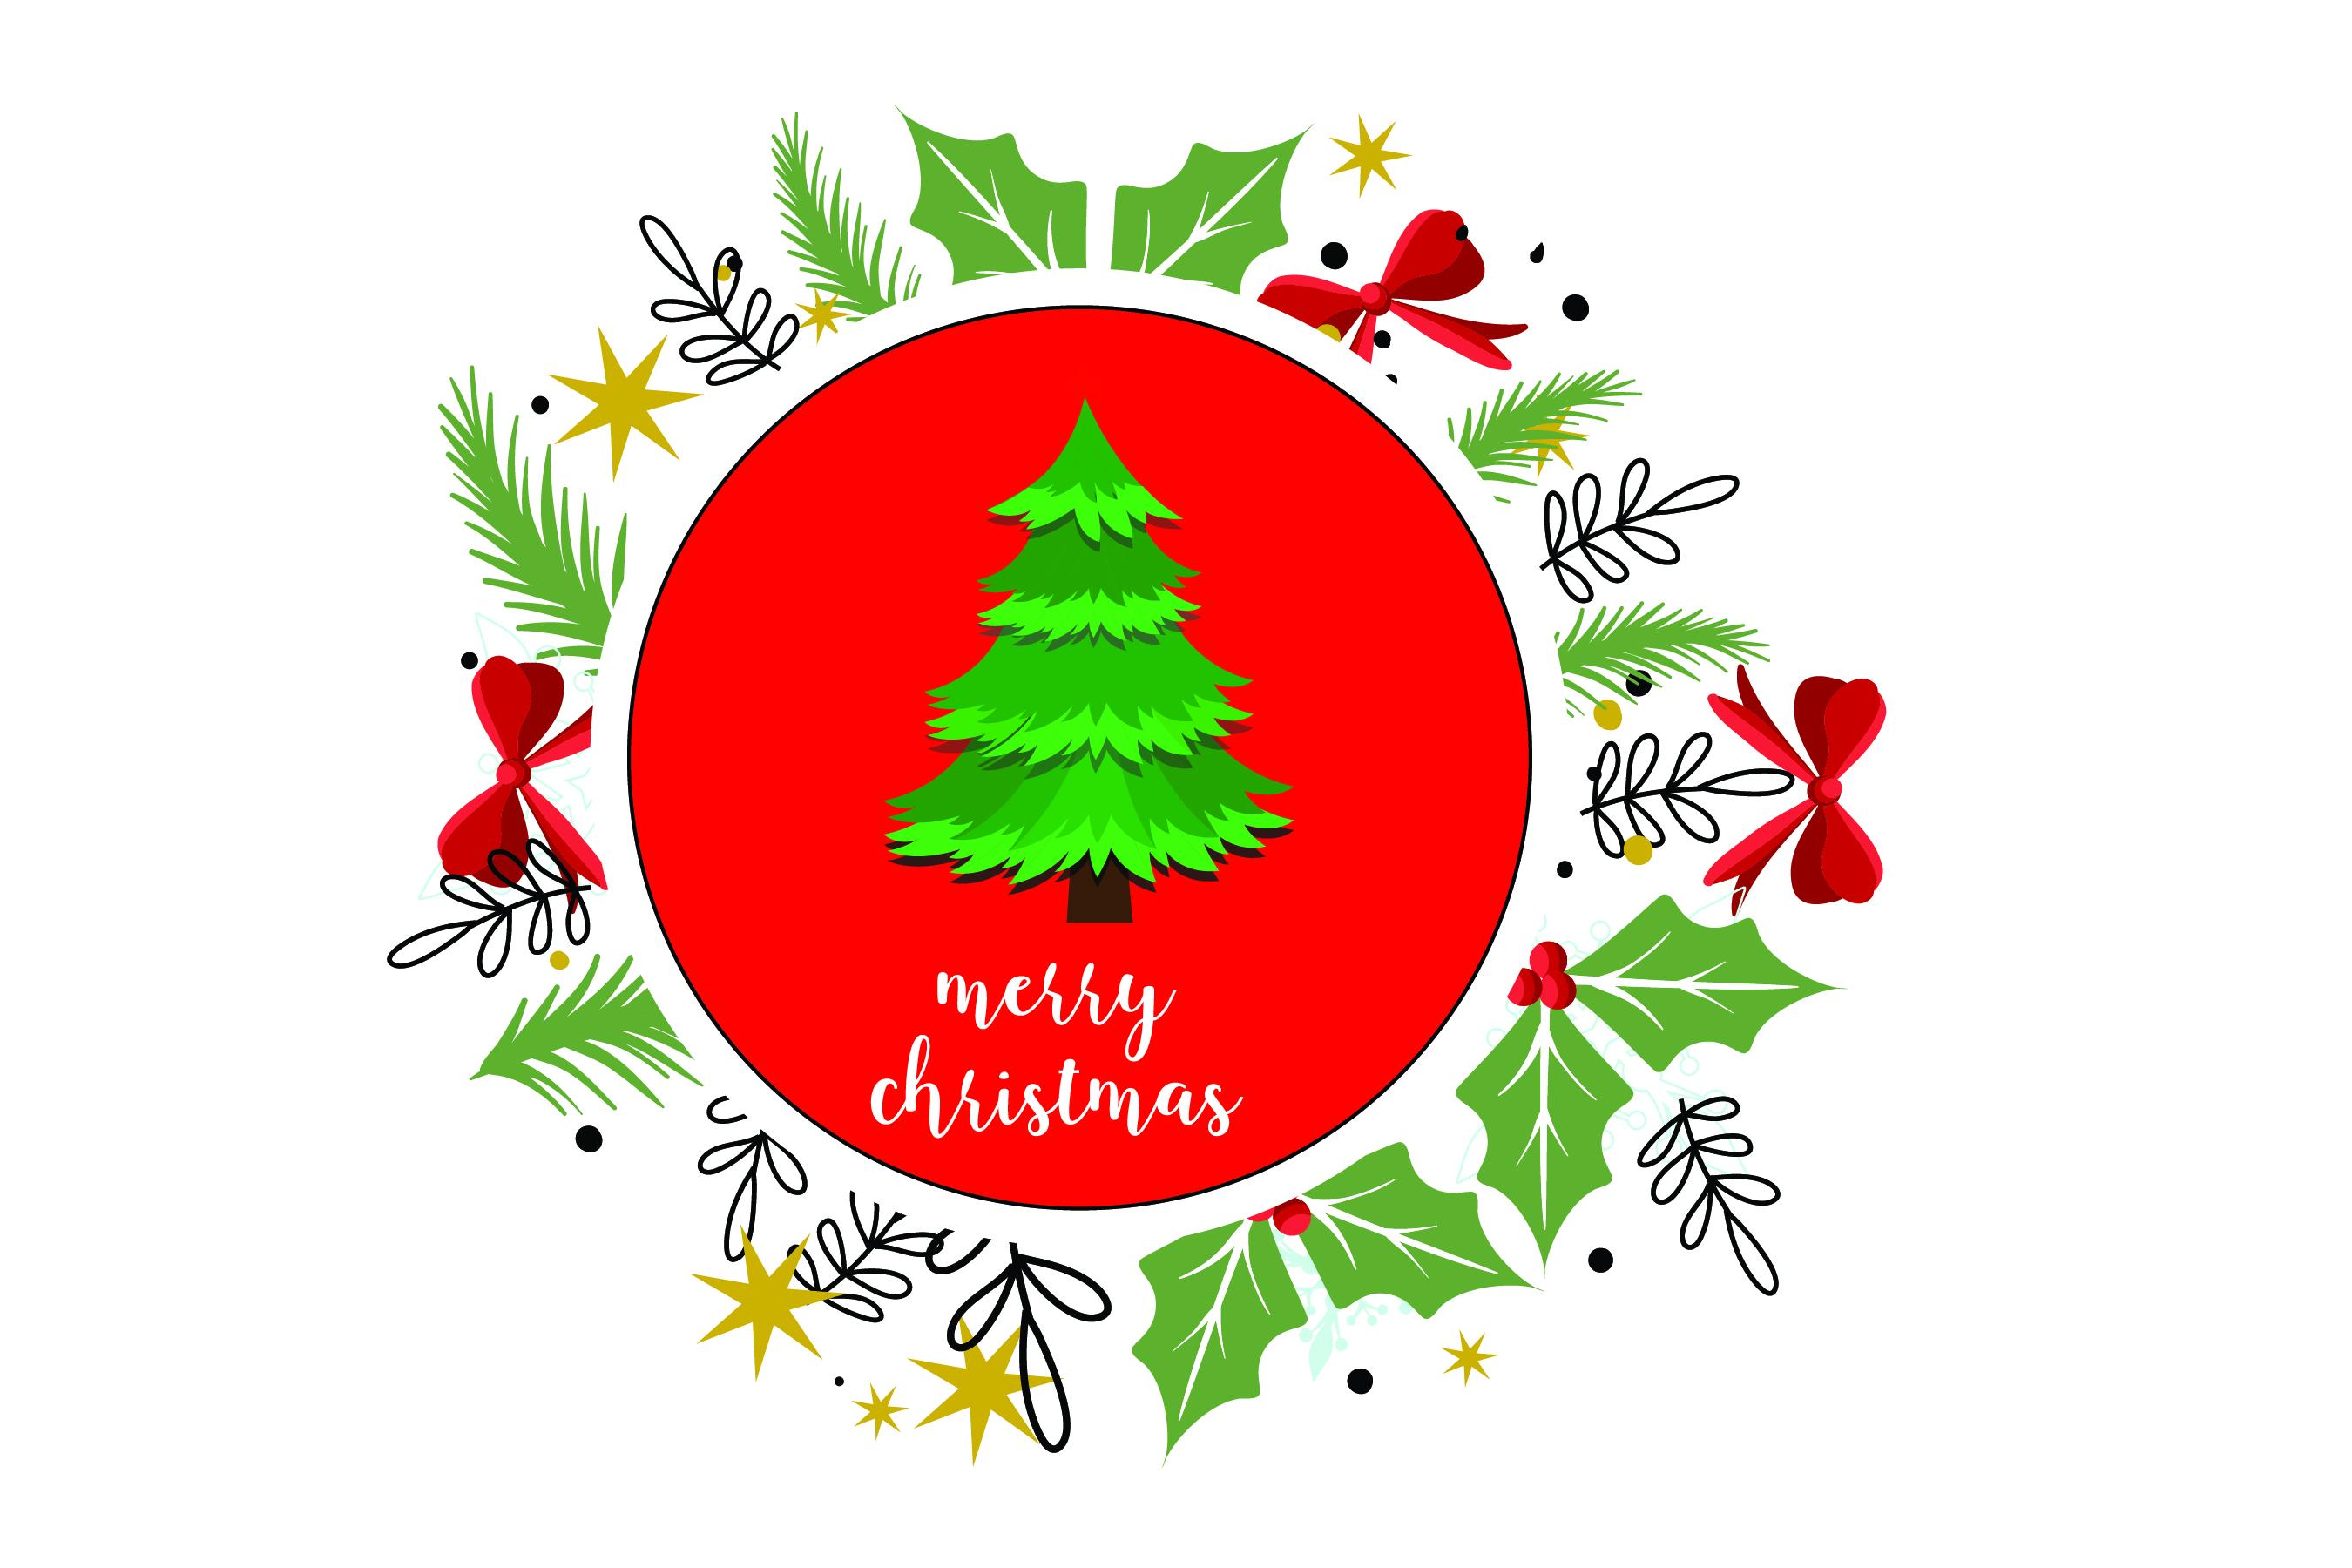 Merry Christmas-SVG Cut File-Coffee Mug Design-Greeting Card example image 5